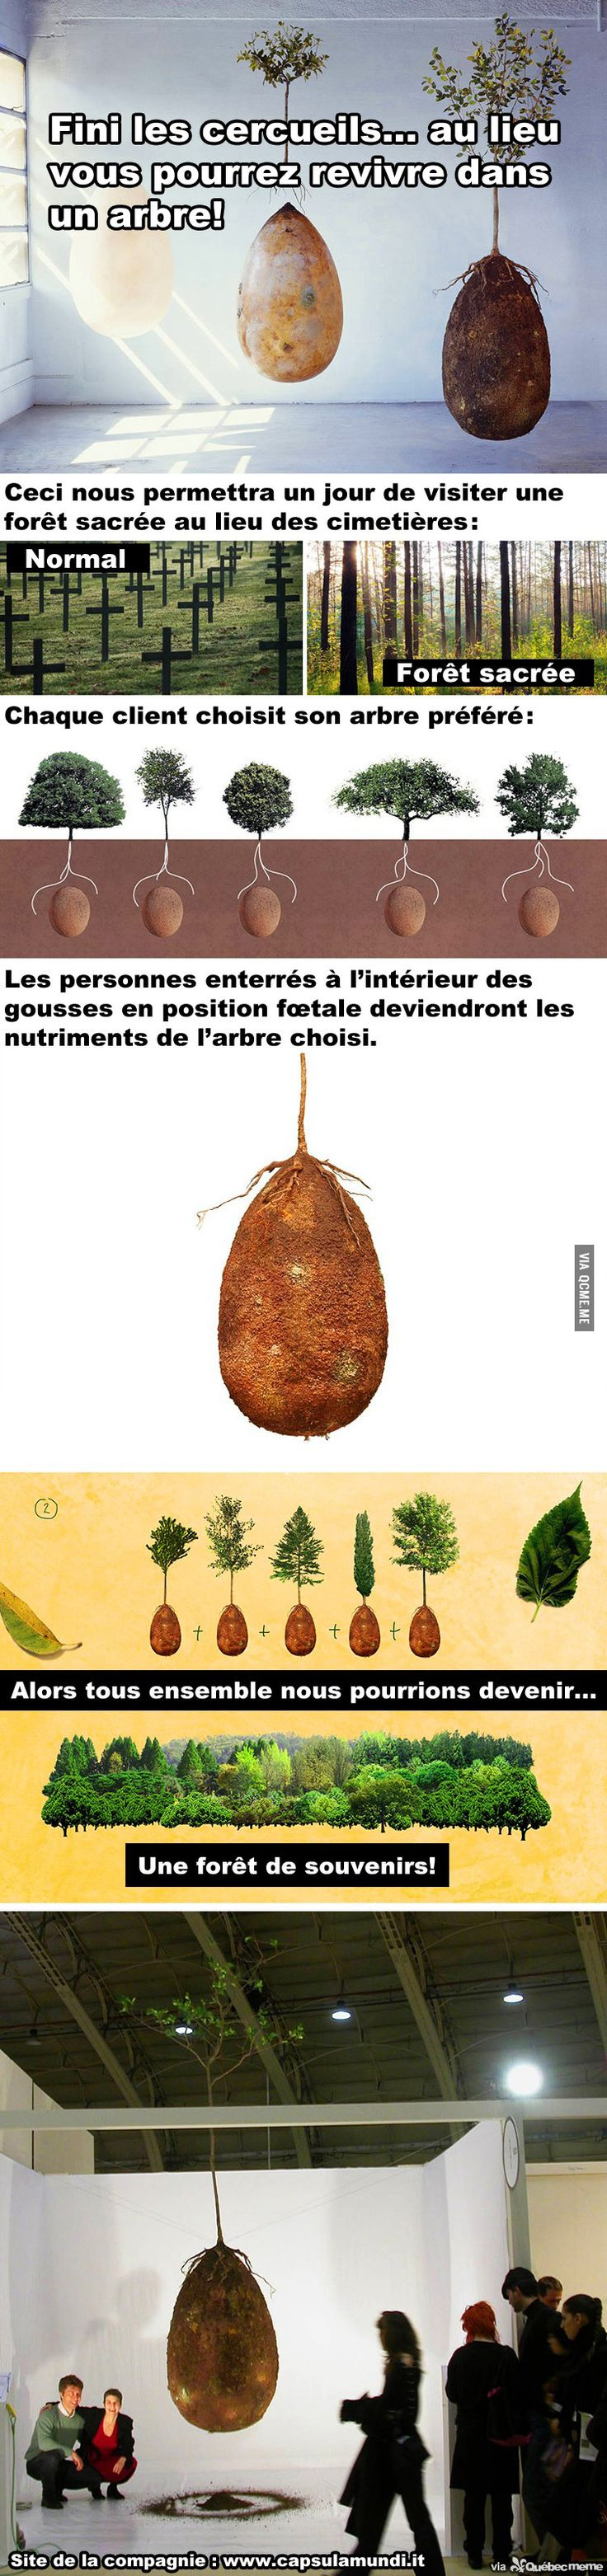 Capsules biodégradables